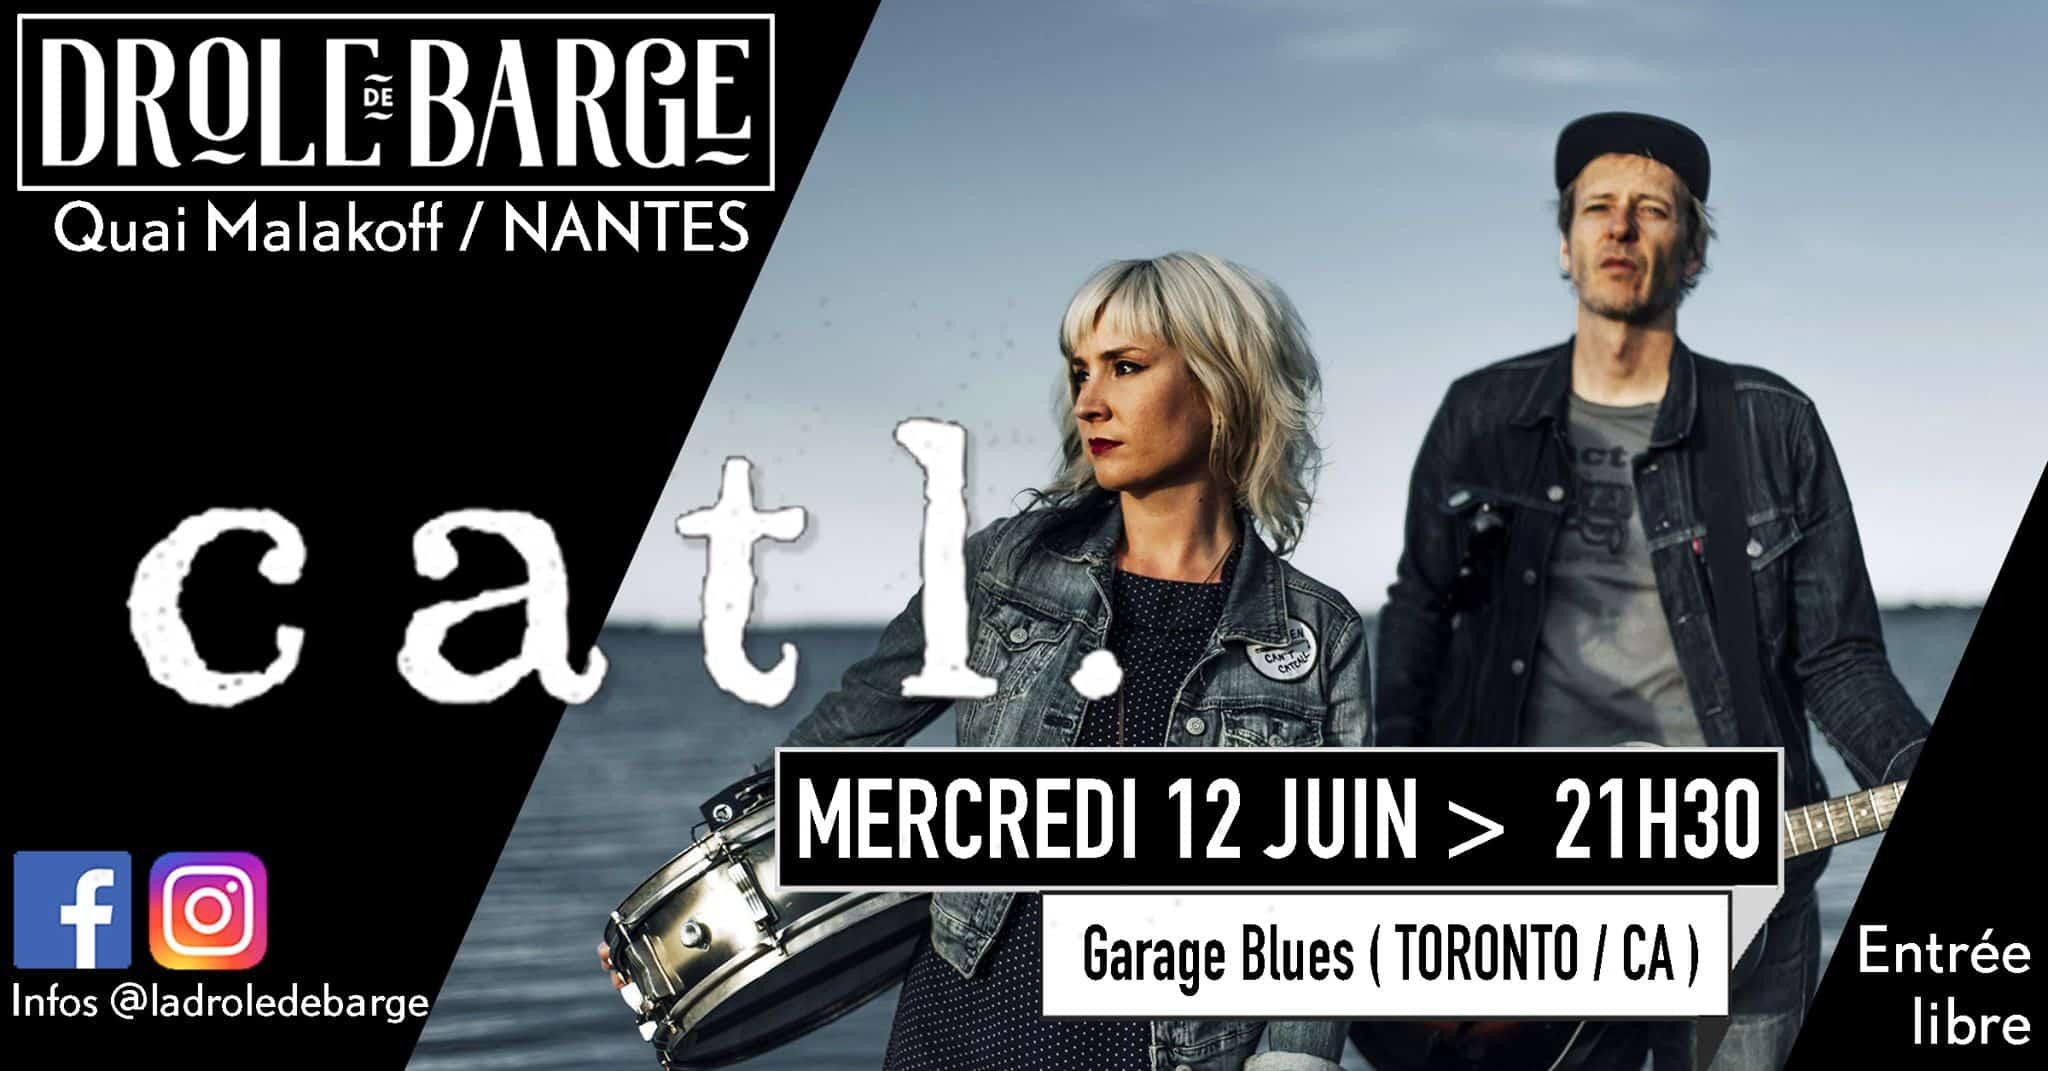 la-drole-de-barge-catl-nantes-concert